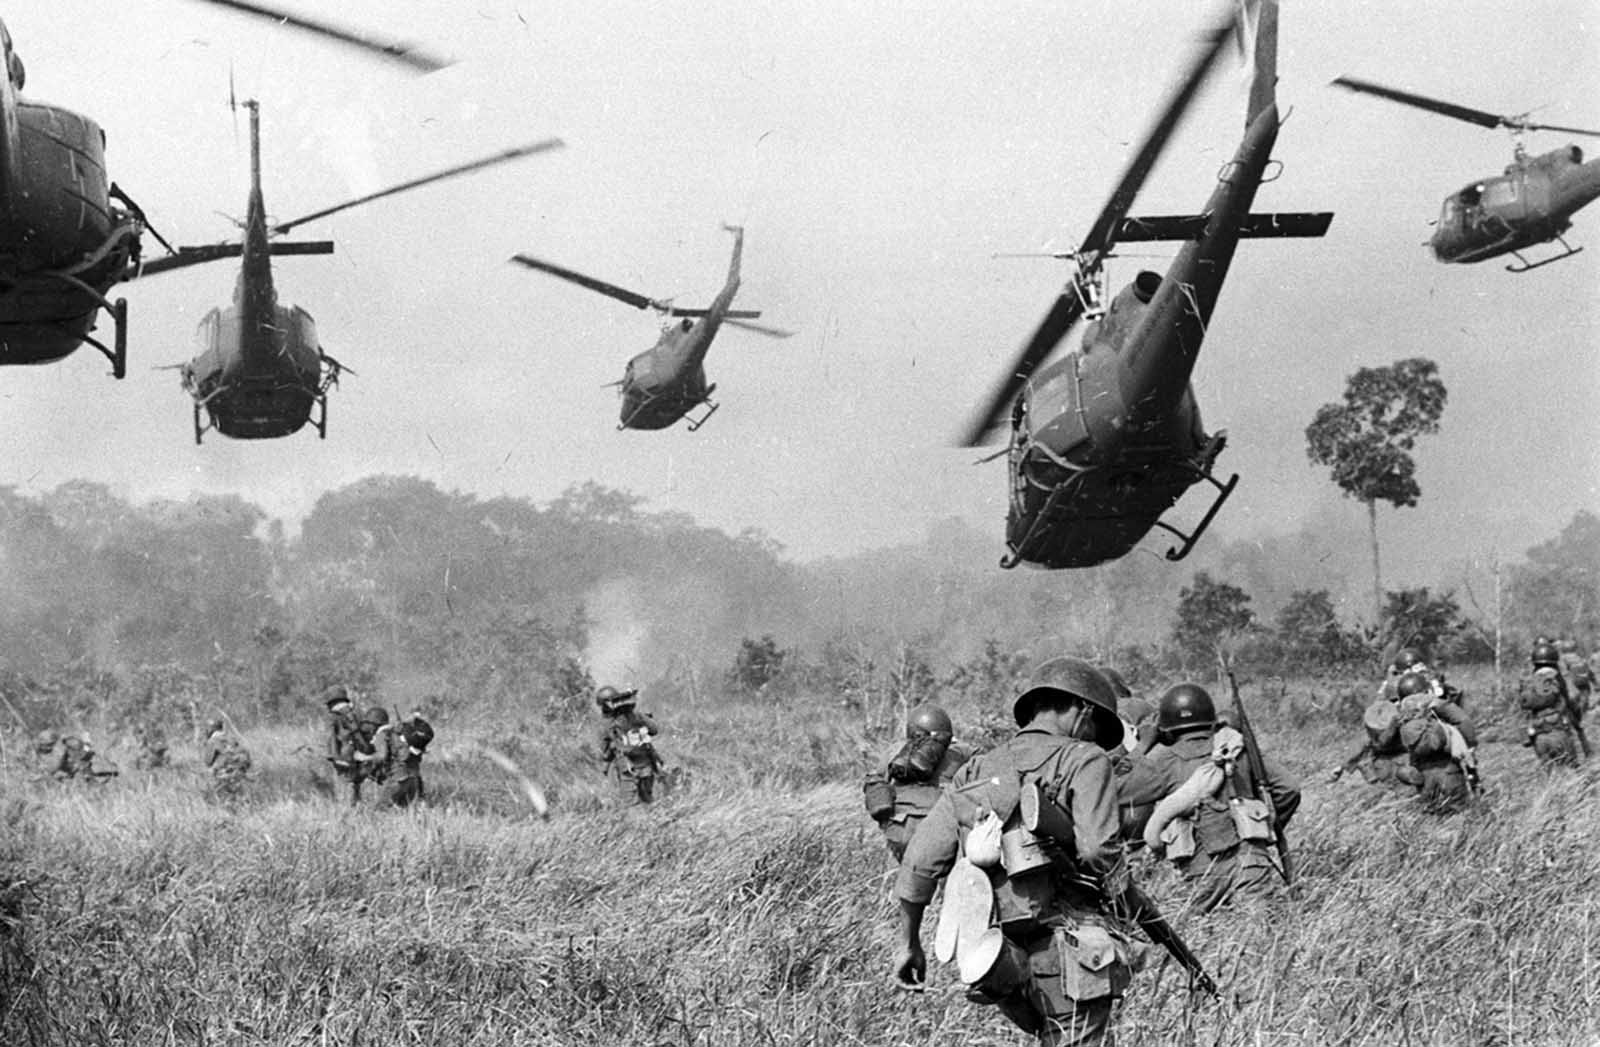 Vietnam_war_early_years (1).jpg